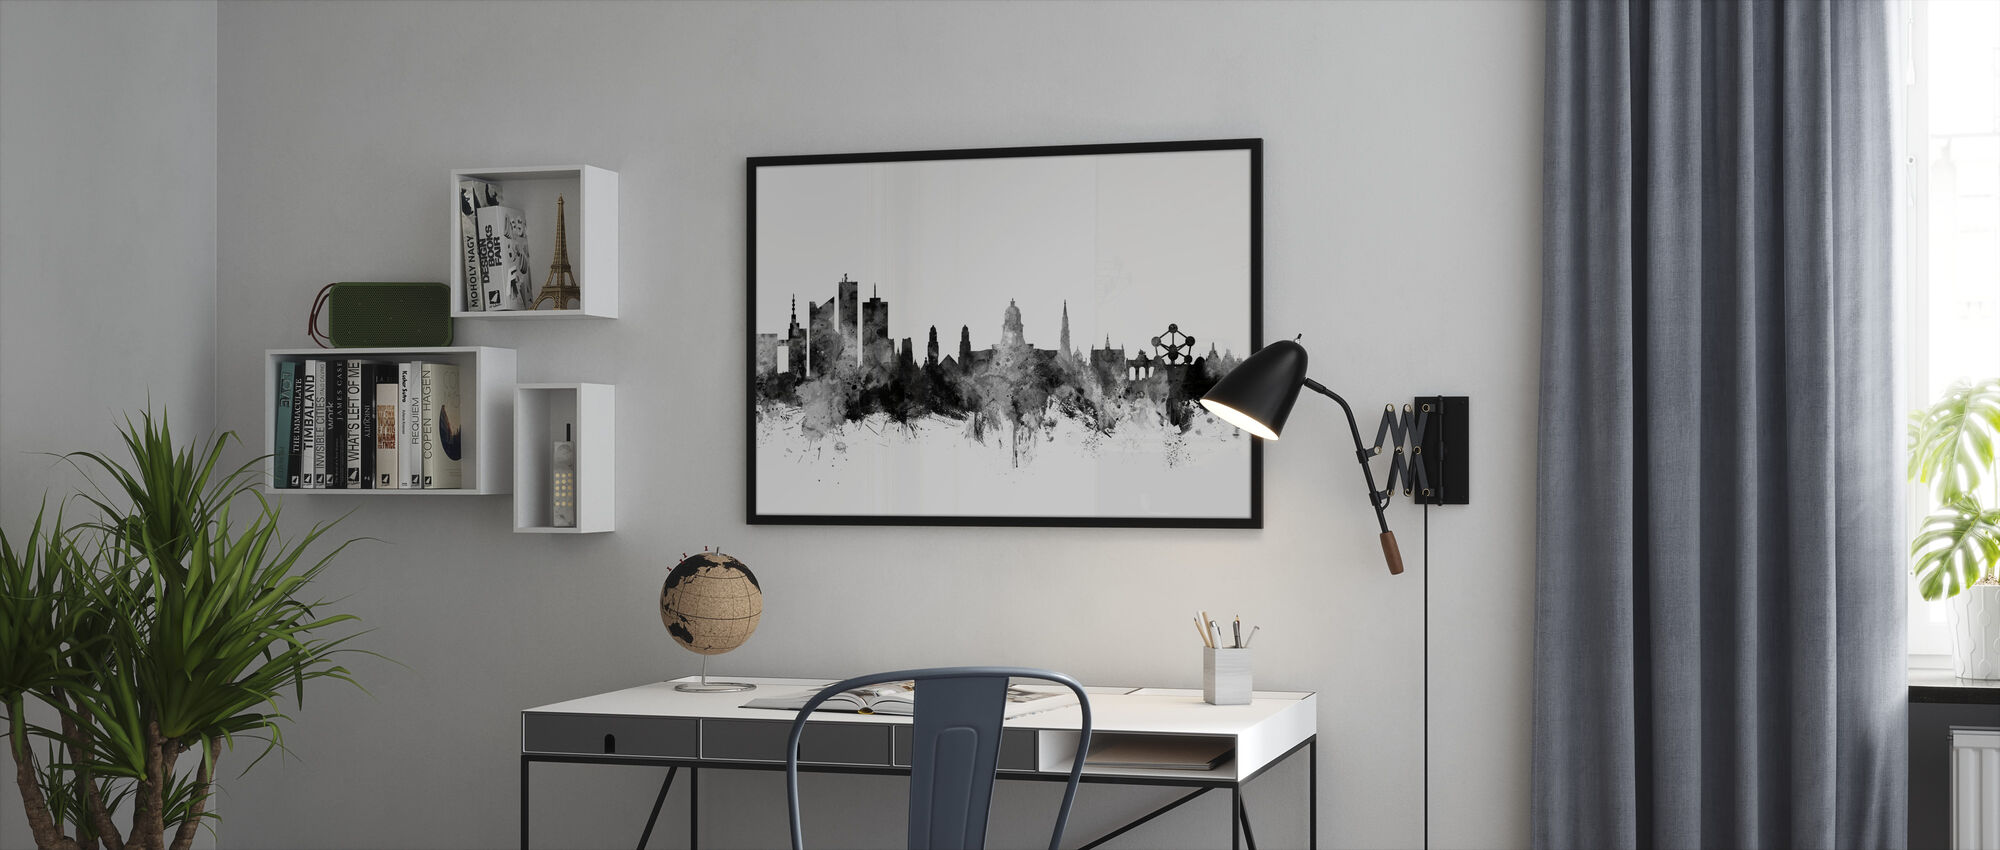 Brussels Skyline Black - Framed print - Office